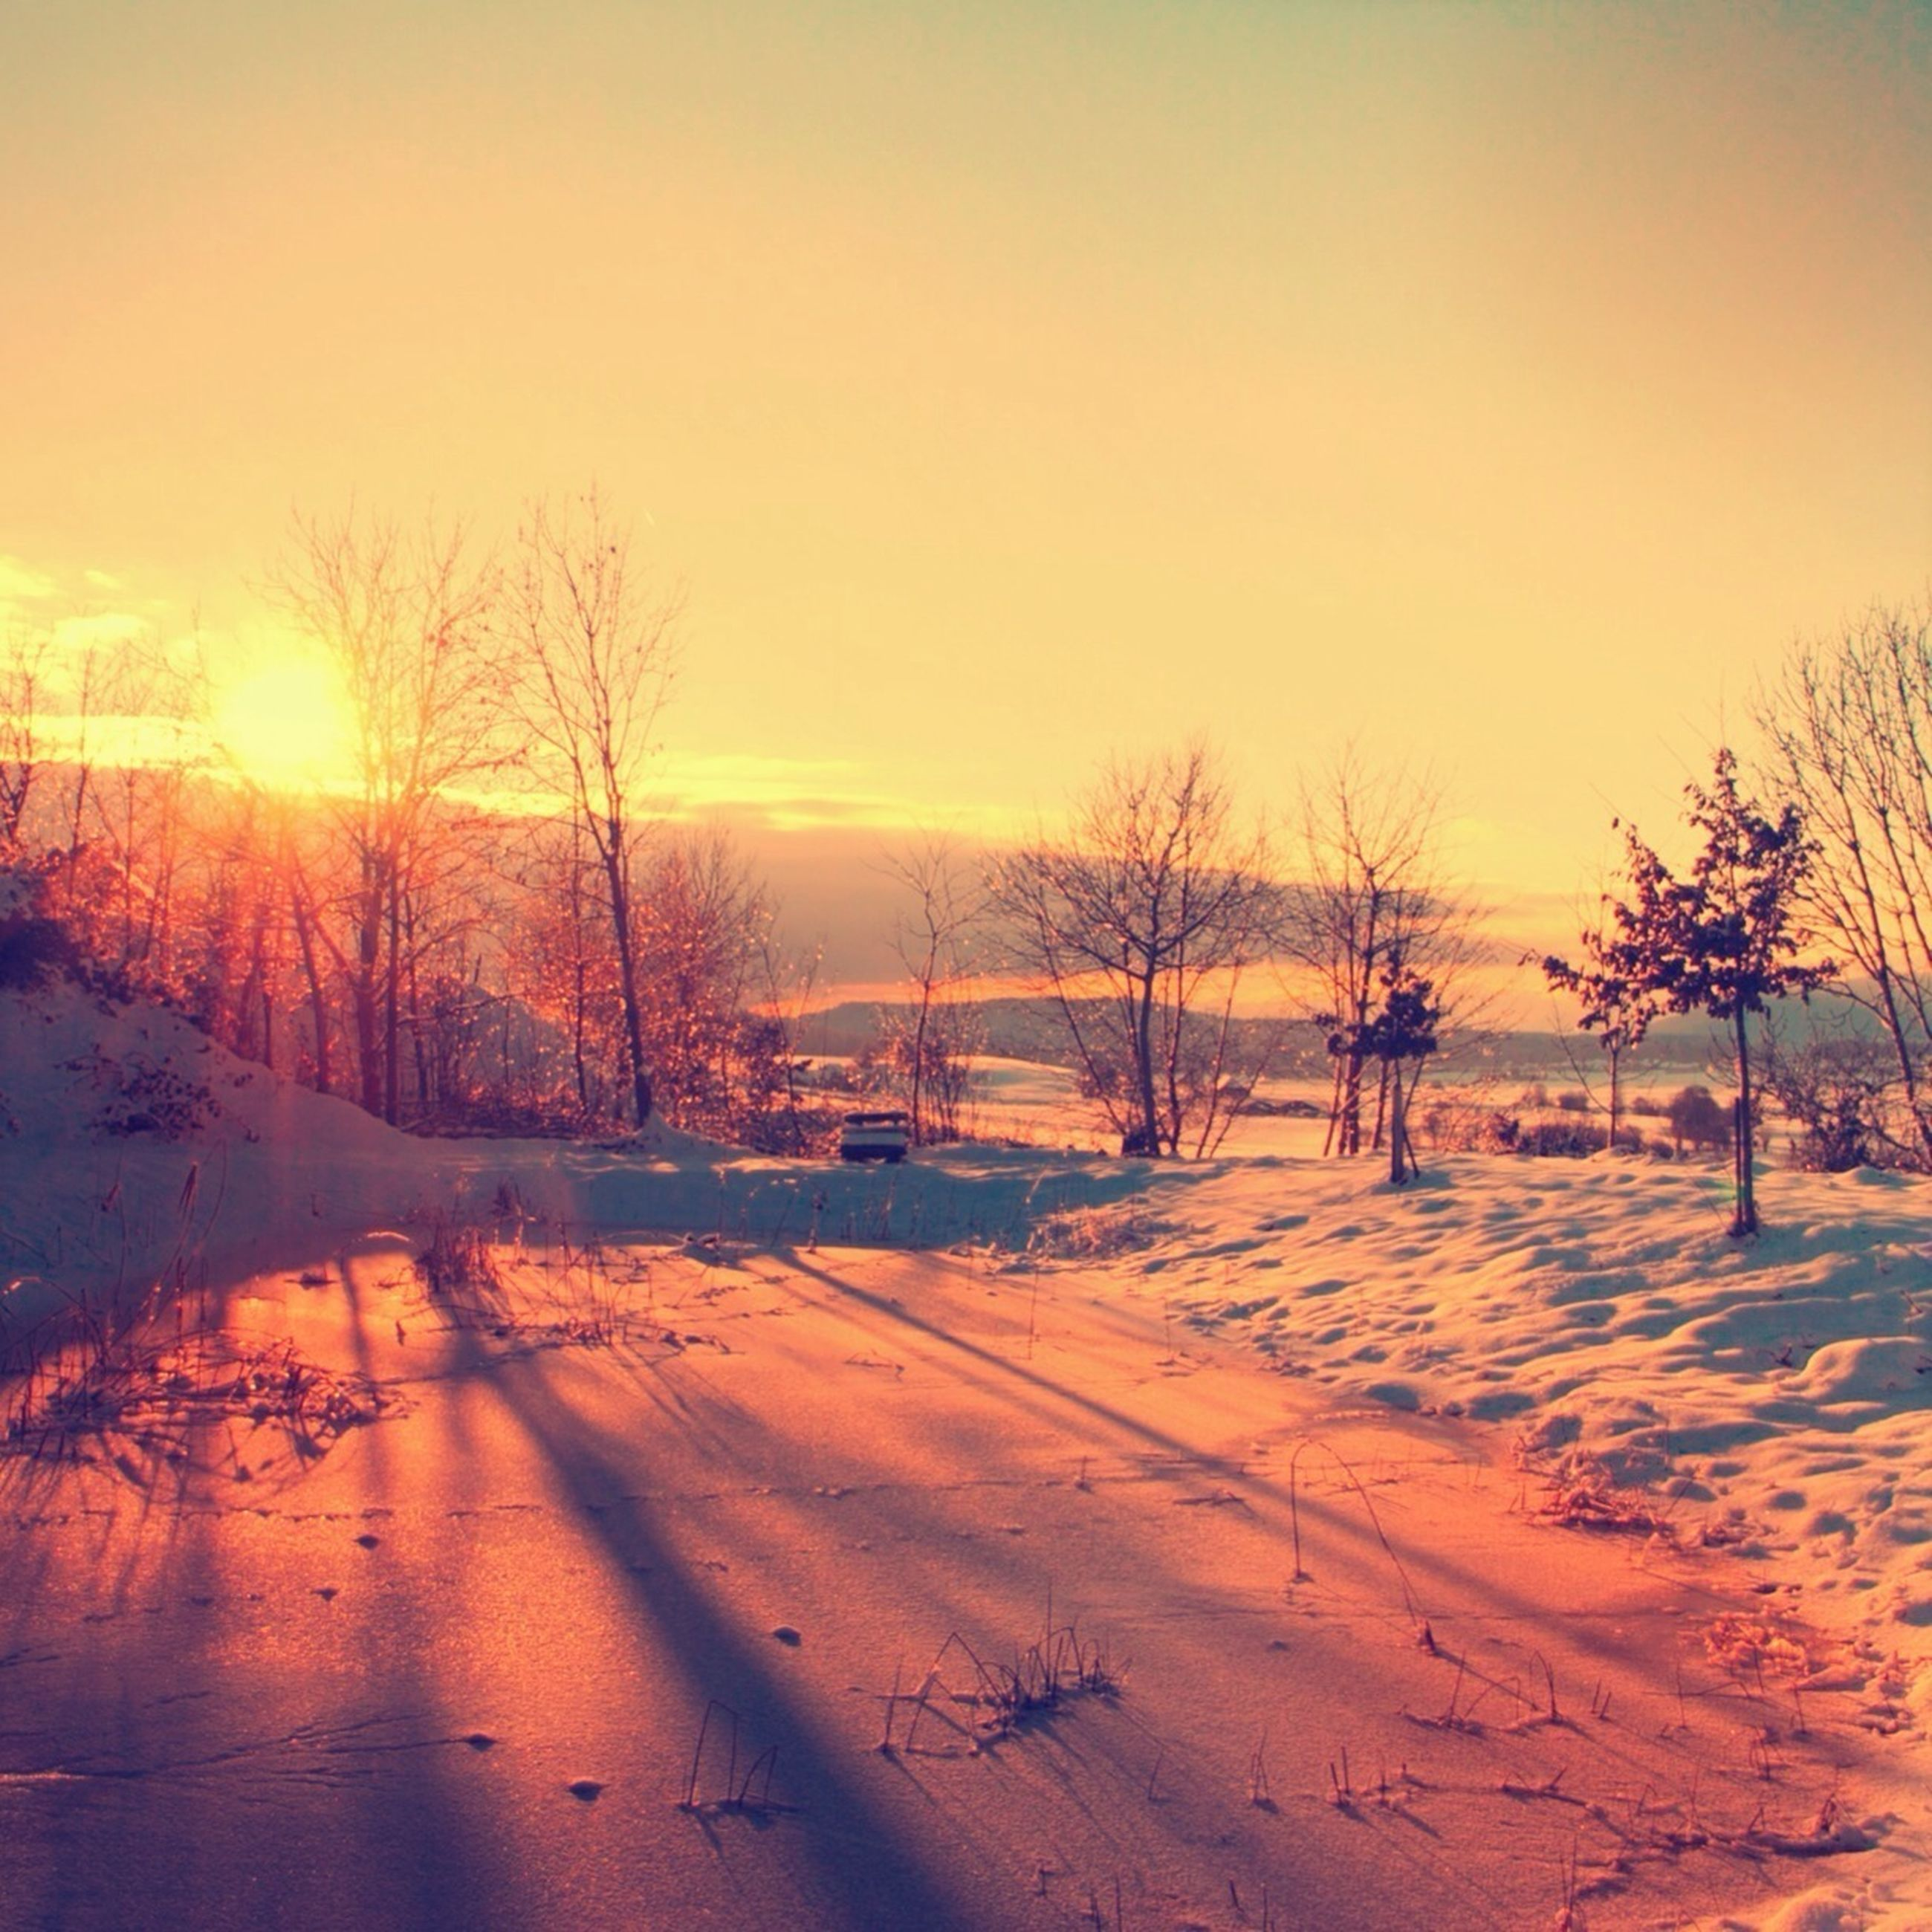 sunset, snow, winter, cold temperature, sun, tranquil scene, bare tree, tranquility, scenics, beauty in nature, tree, orange color, season, nature, landscape, clear sky, sunlight, field, idyllic, sky